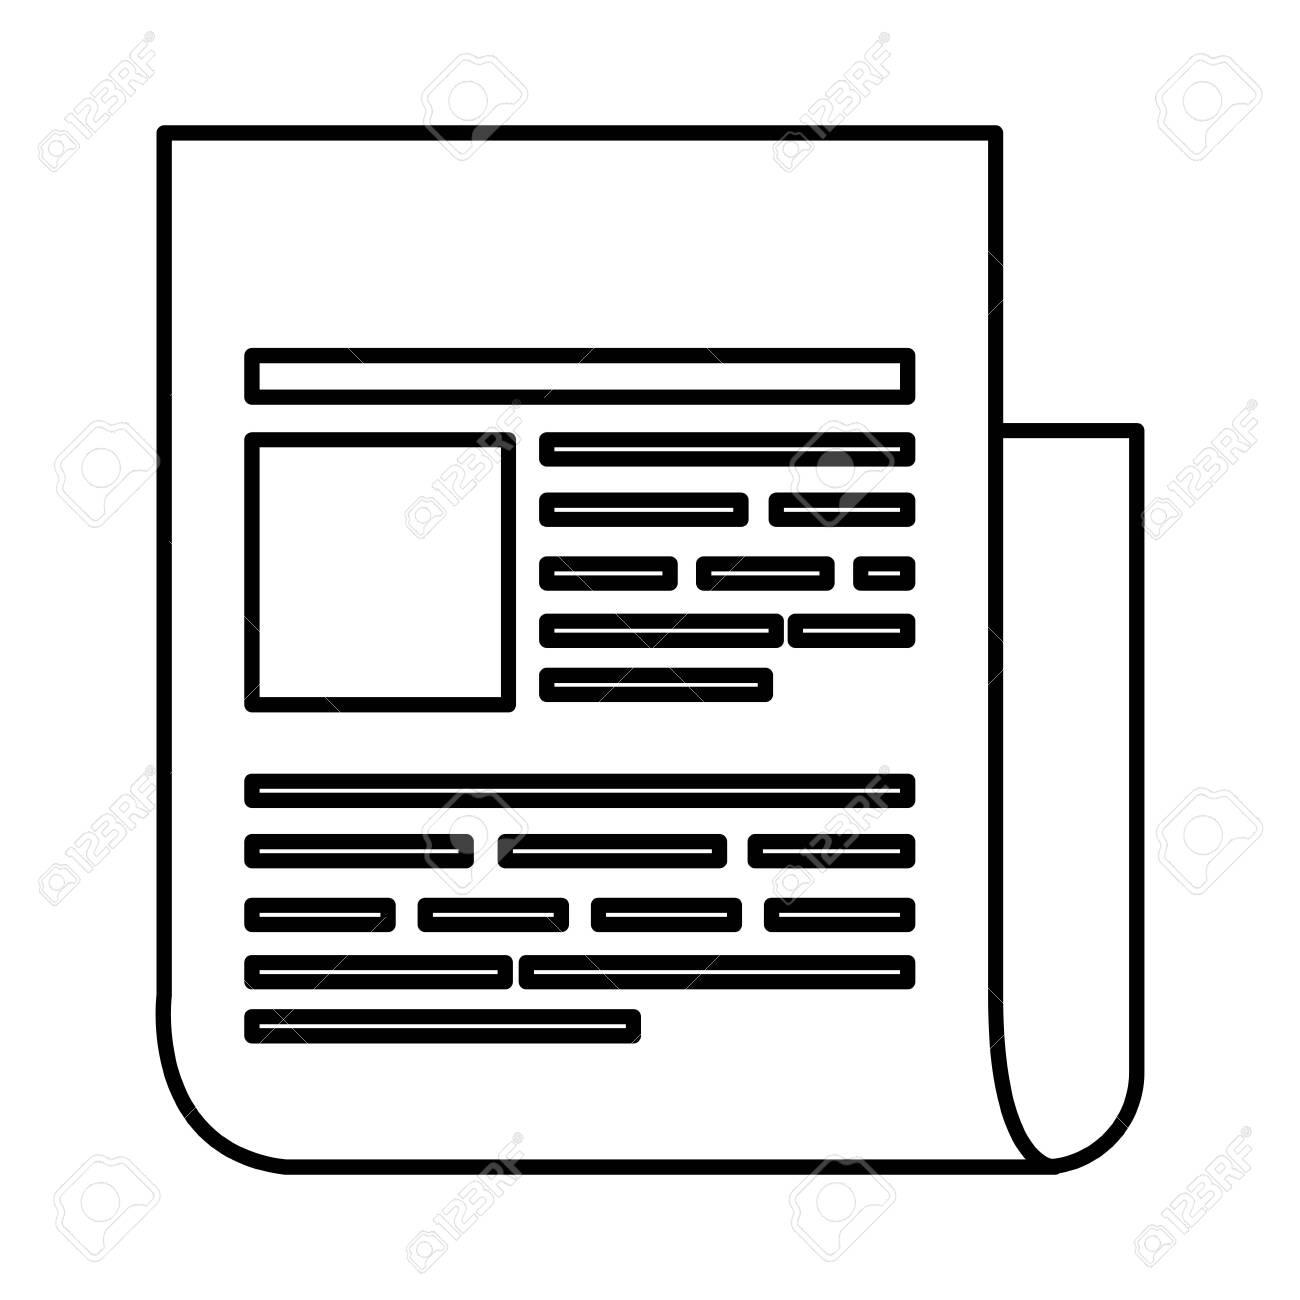 paper document file icon vector illustration design - 126404842